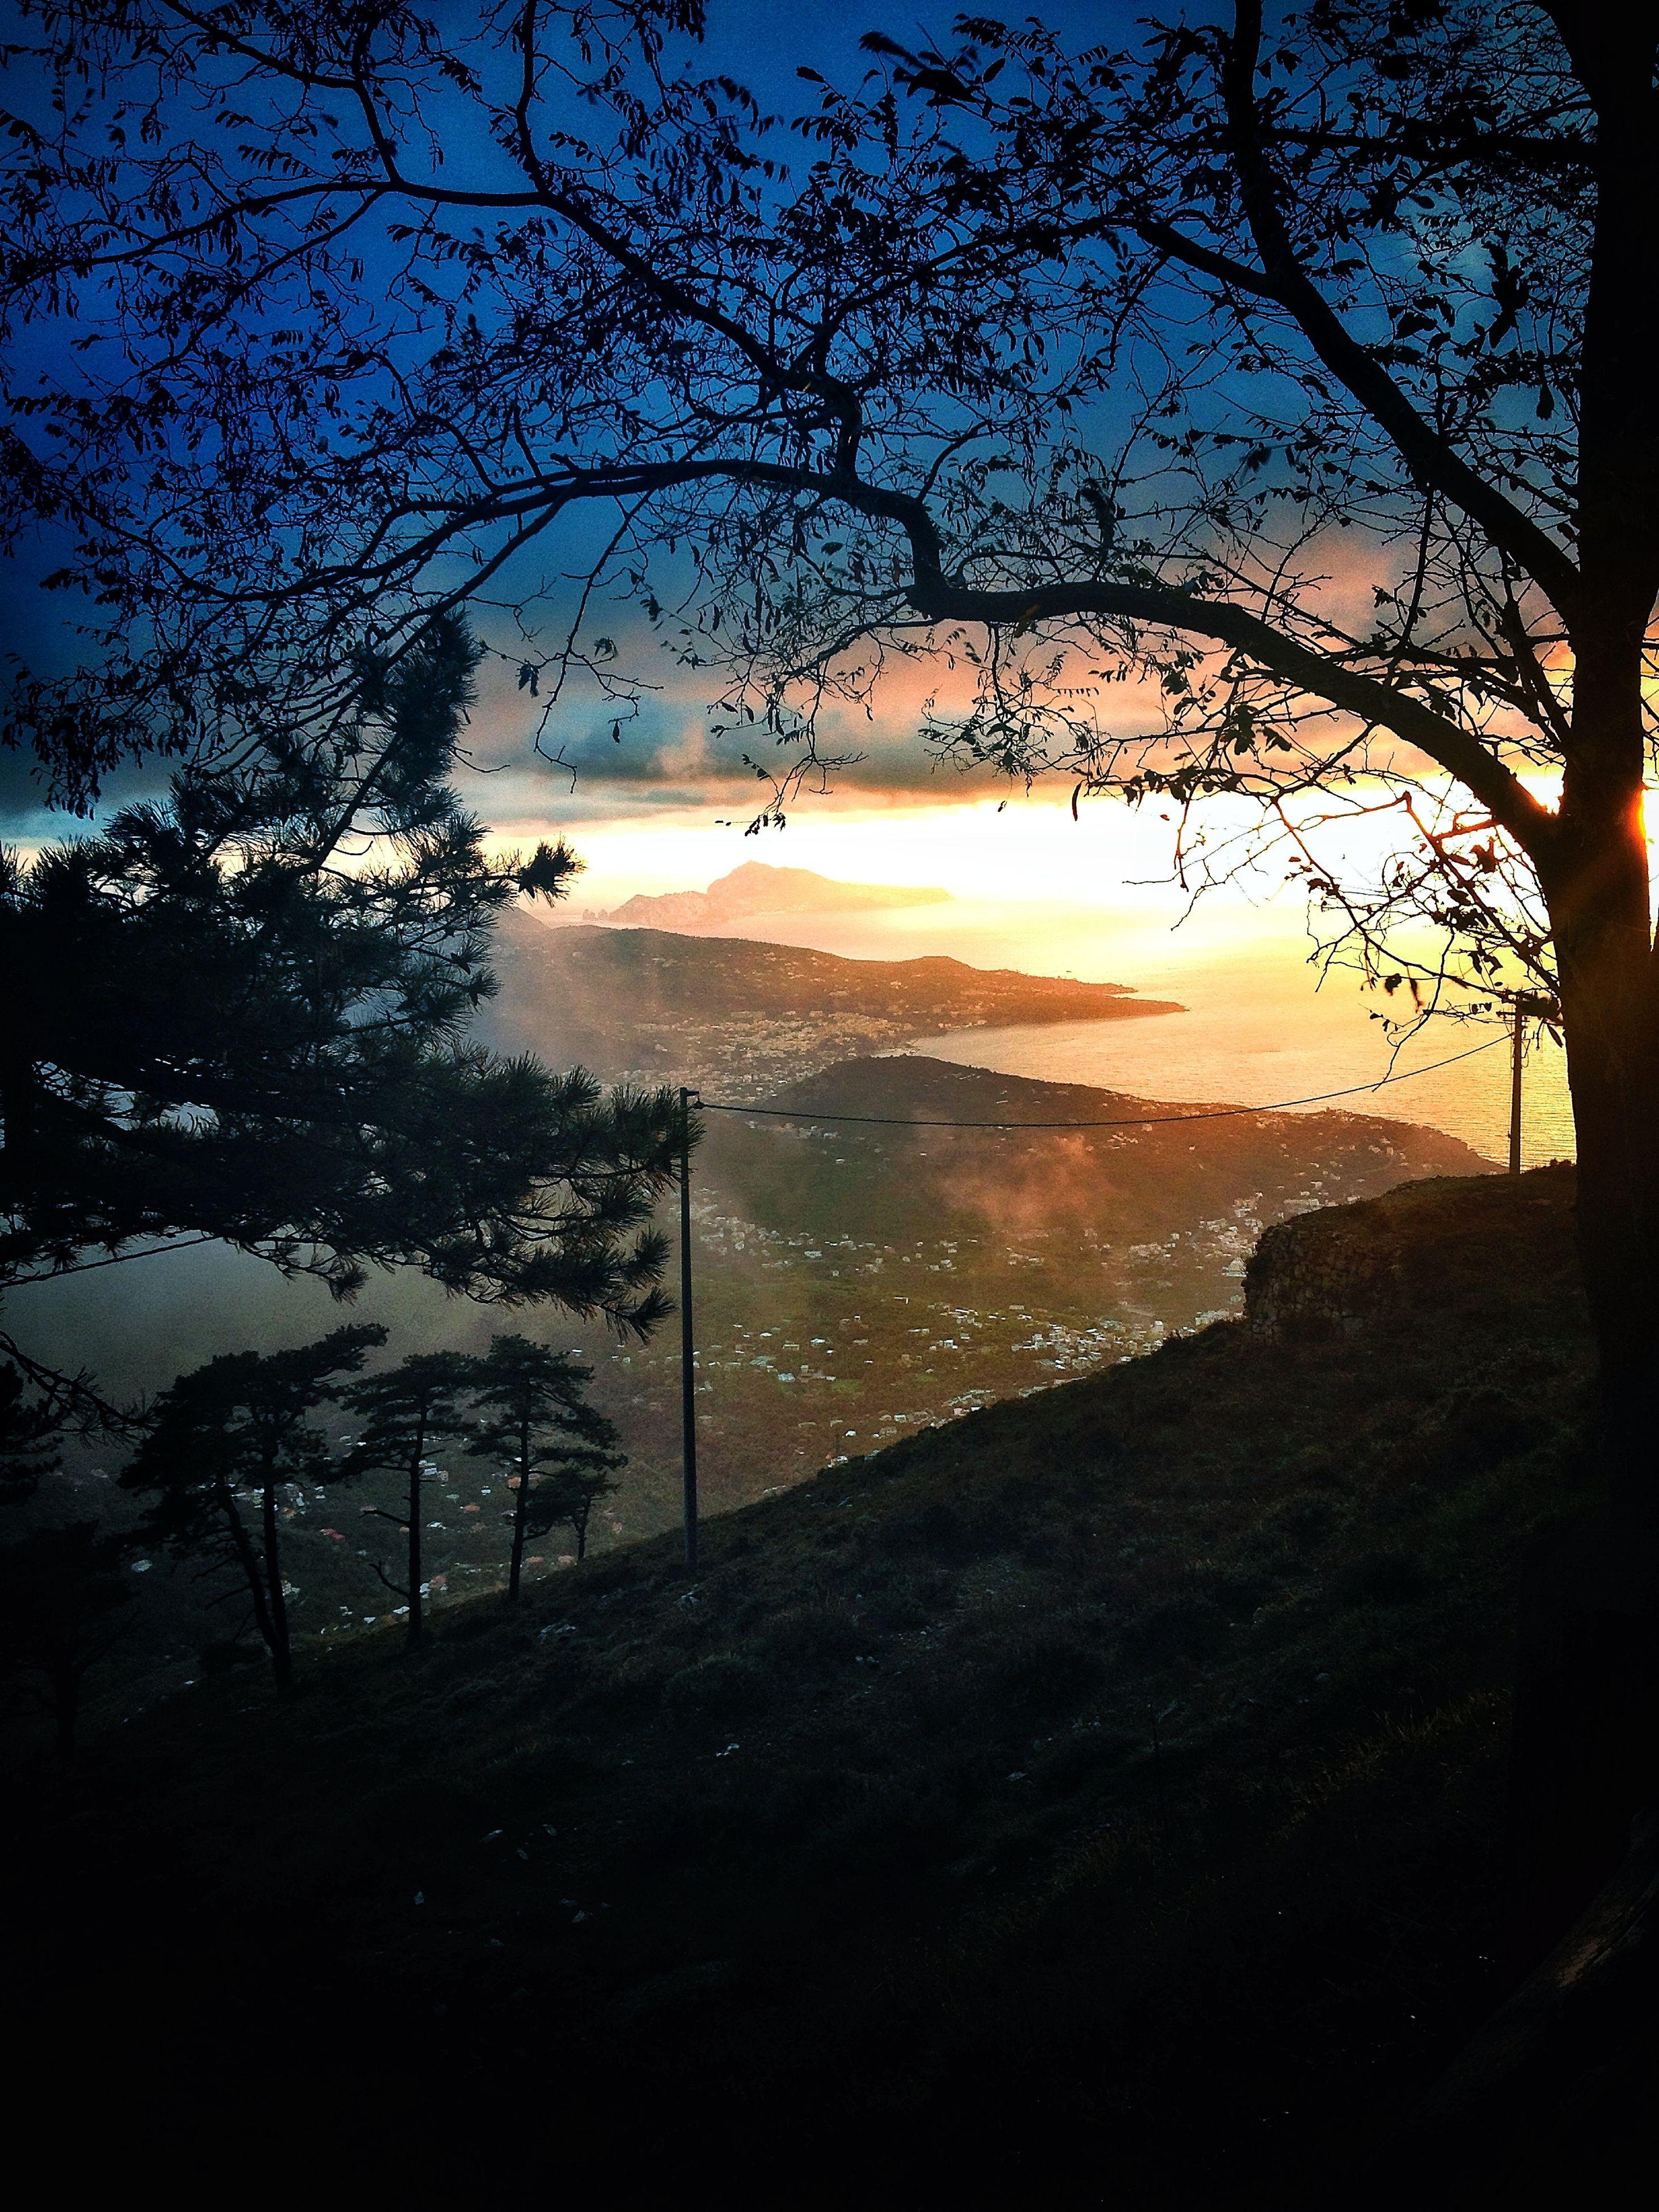 silhouette, sunset, tree, tranquility, tranquil scene, scenics, sun, branch, beauty in nature, sky, bare tree, nature, water, idyllic, sunlight, landscape, non-urban scene, outdoors, sea, dusk